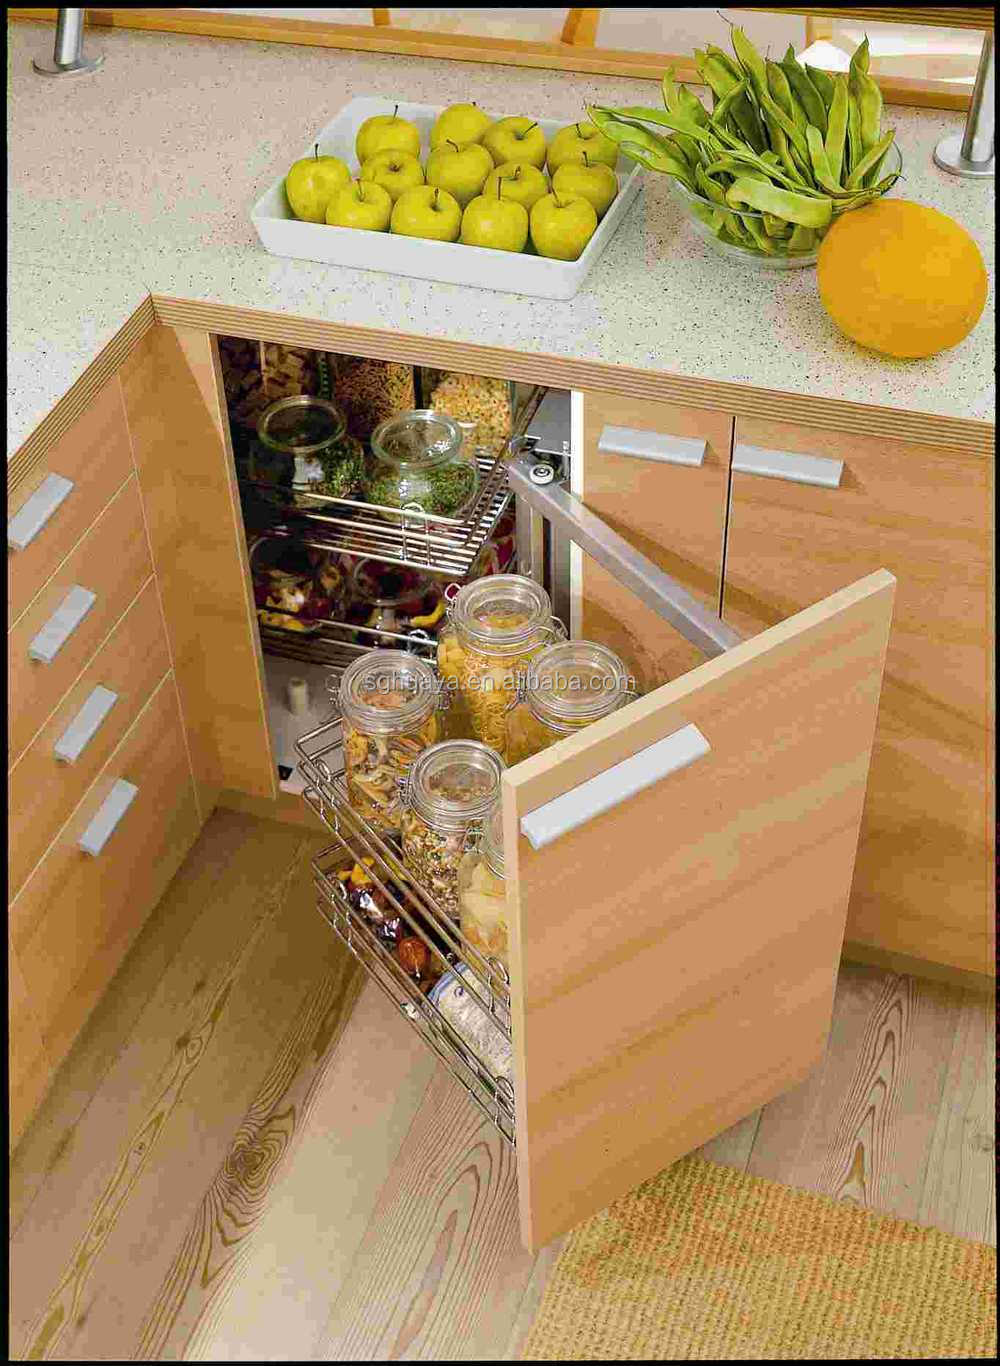 Pvc Wood Grain Open Floorplan Philippines Kitchen Cabinet Buy Kitchen Cabinets Design Teak Wood Kitchen Cabinet Laminate Kitchen Cabinet Product On